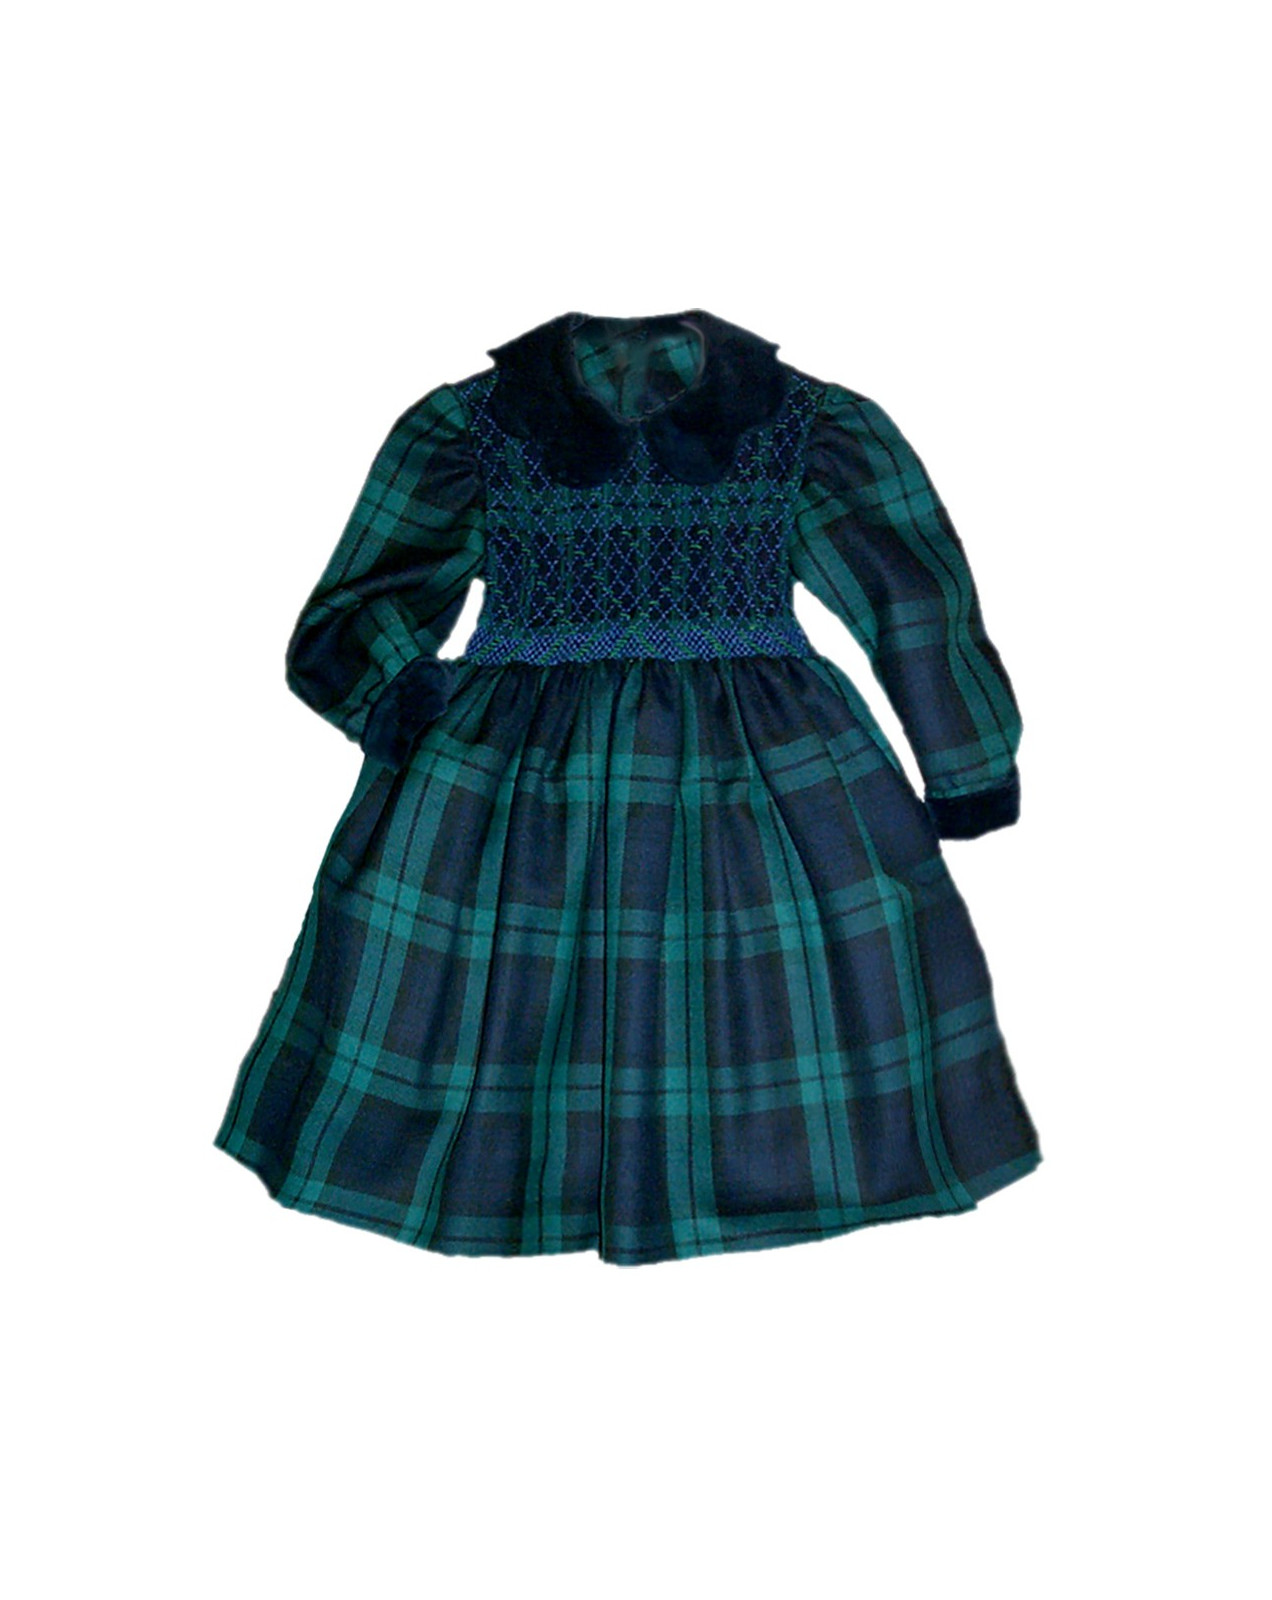 Ersilia abito smock bambina scozzese